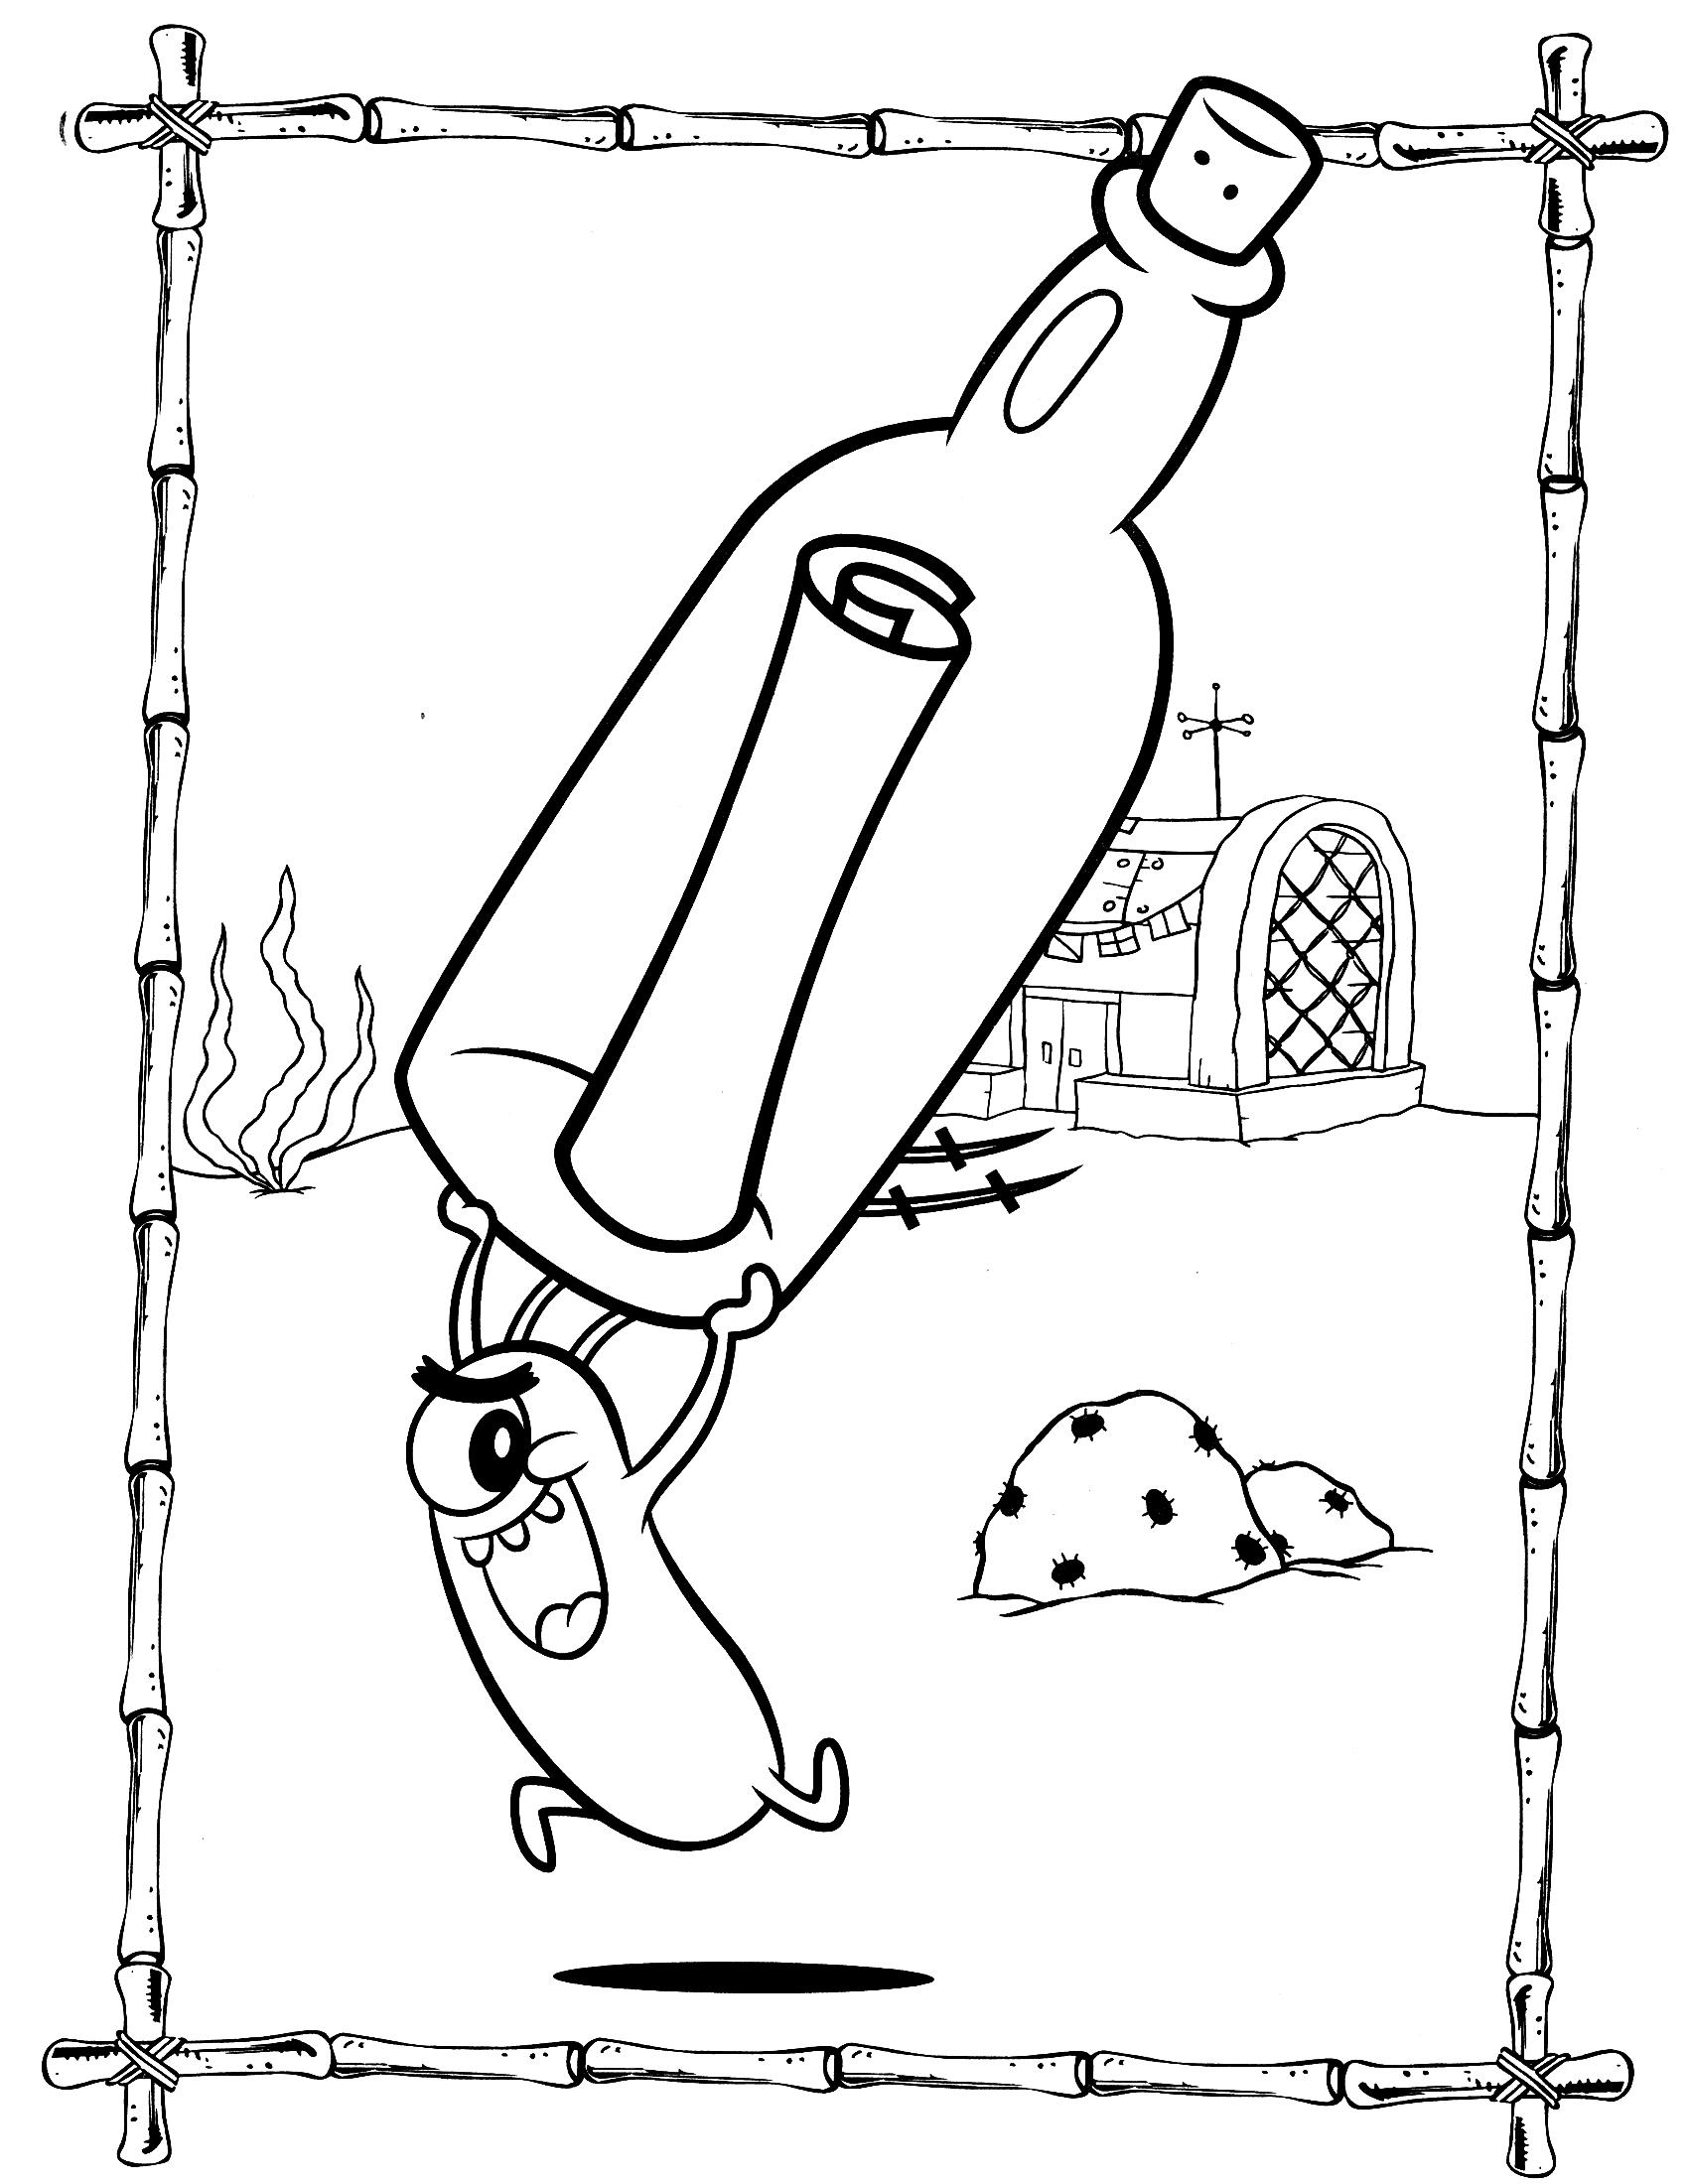 Раскраска Шелдон Планктон - Раскраски Губка Боб - YouLoveIt.ru